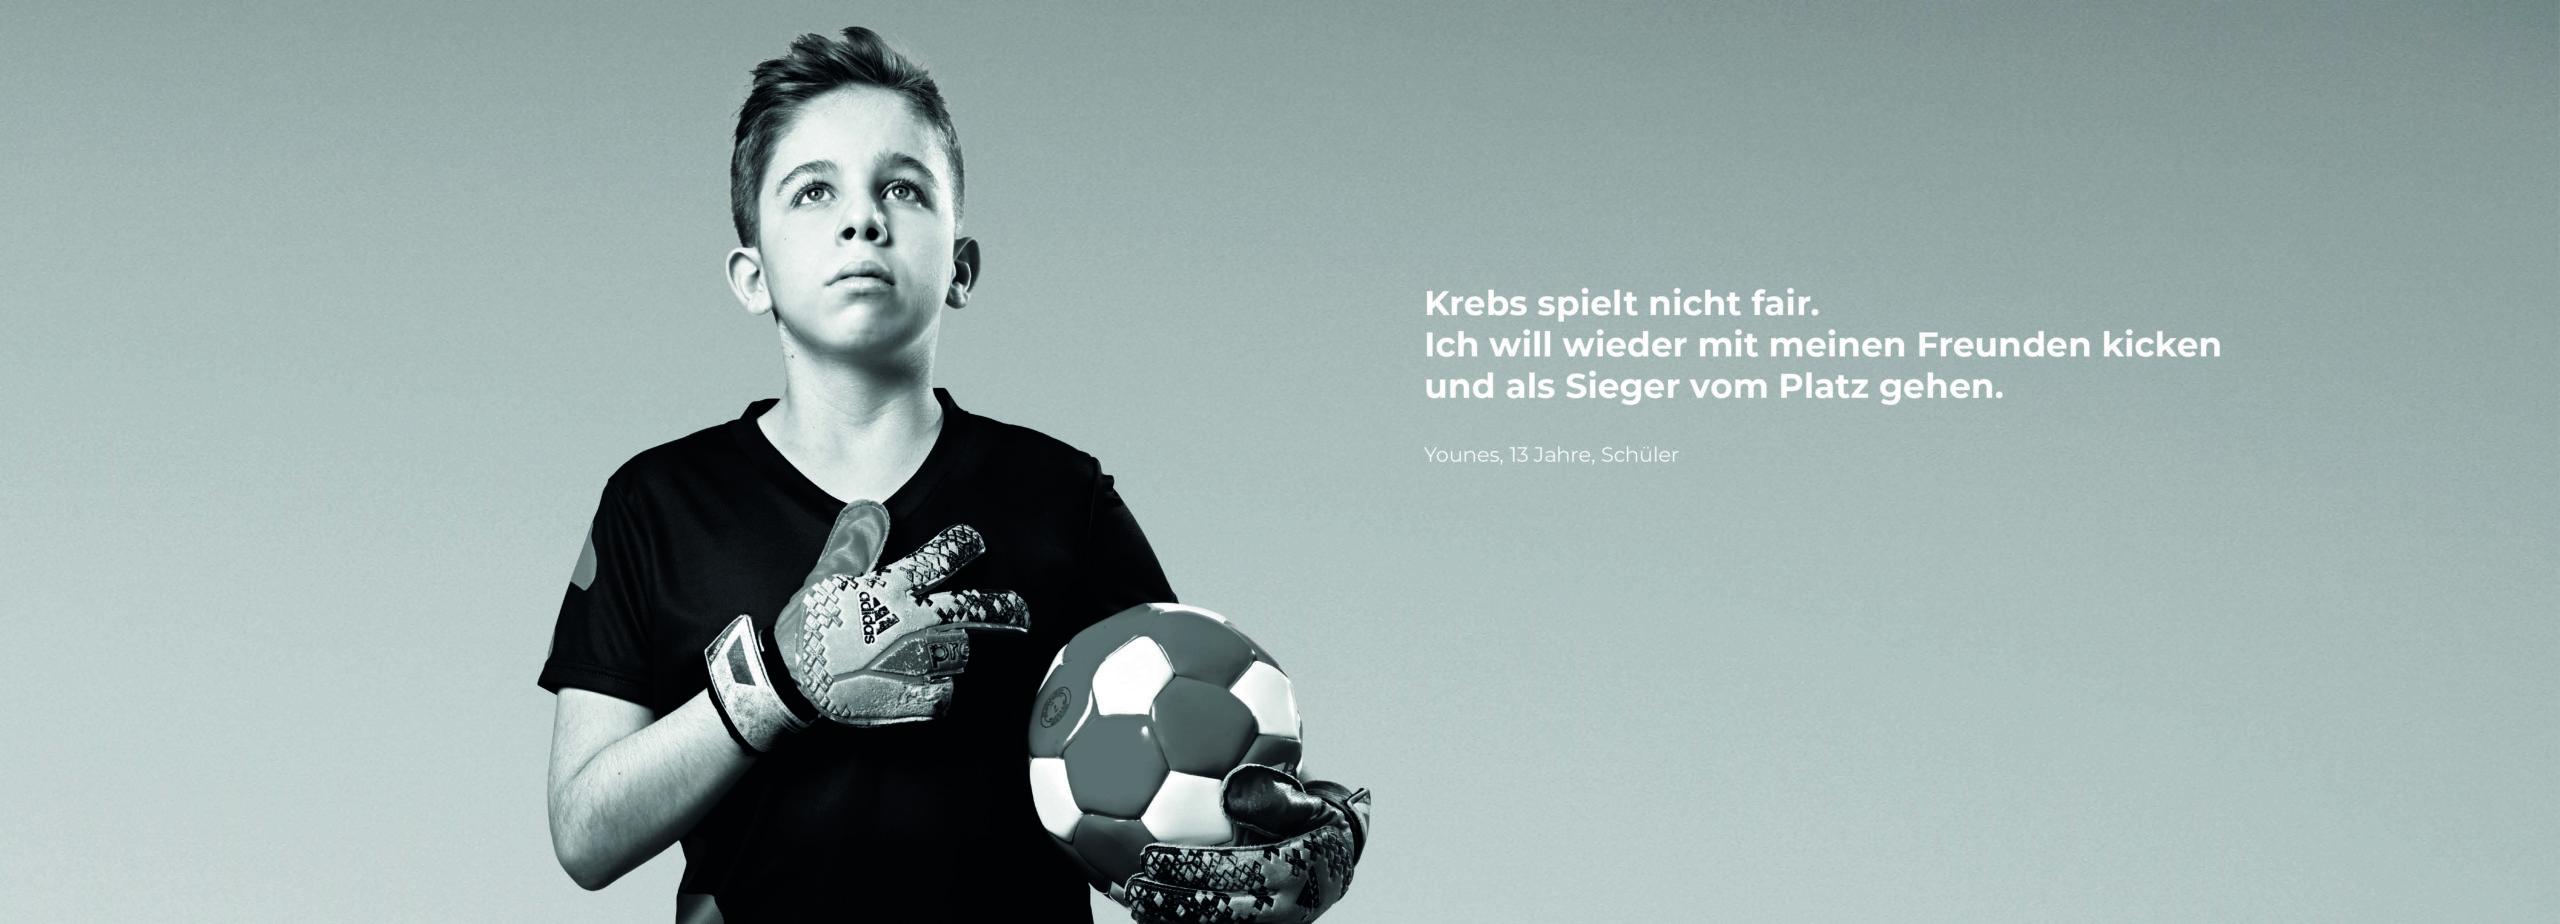 Sportprojekt